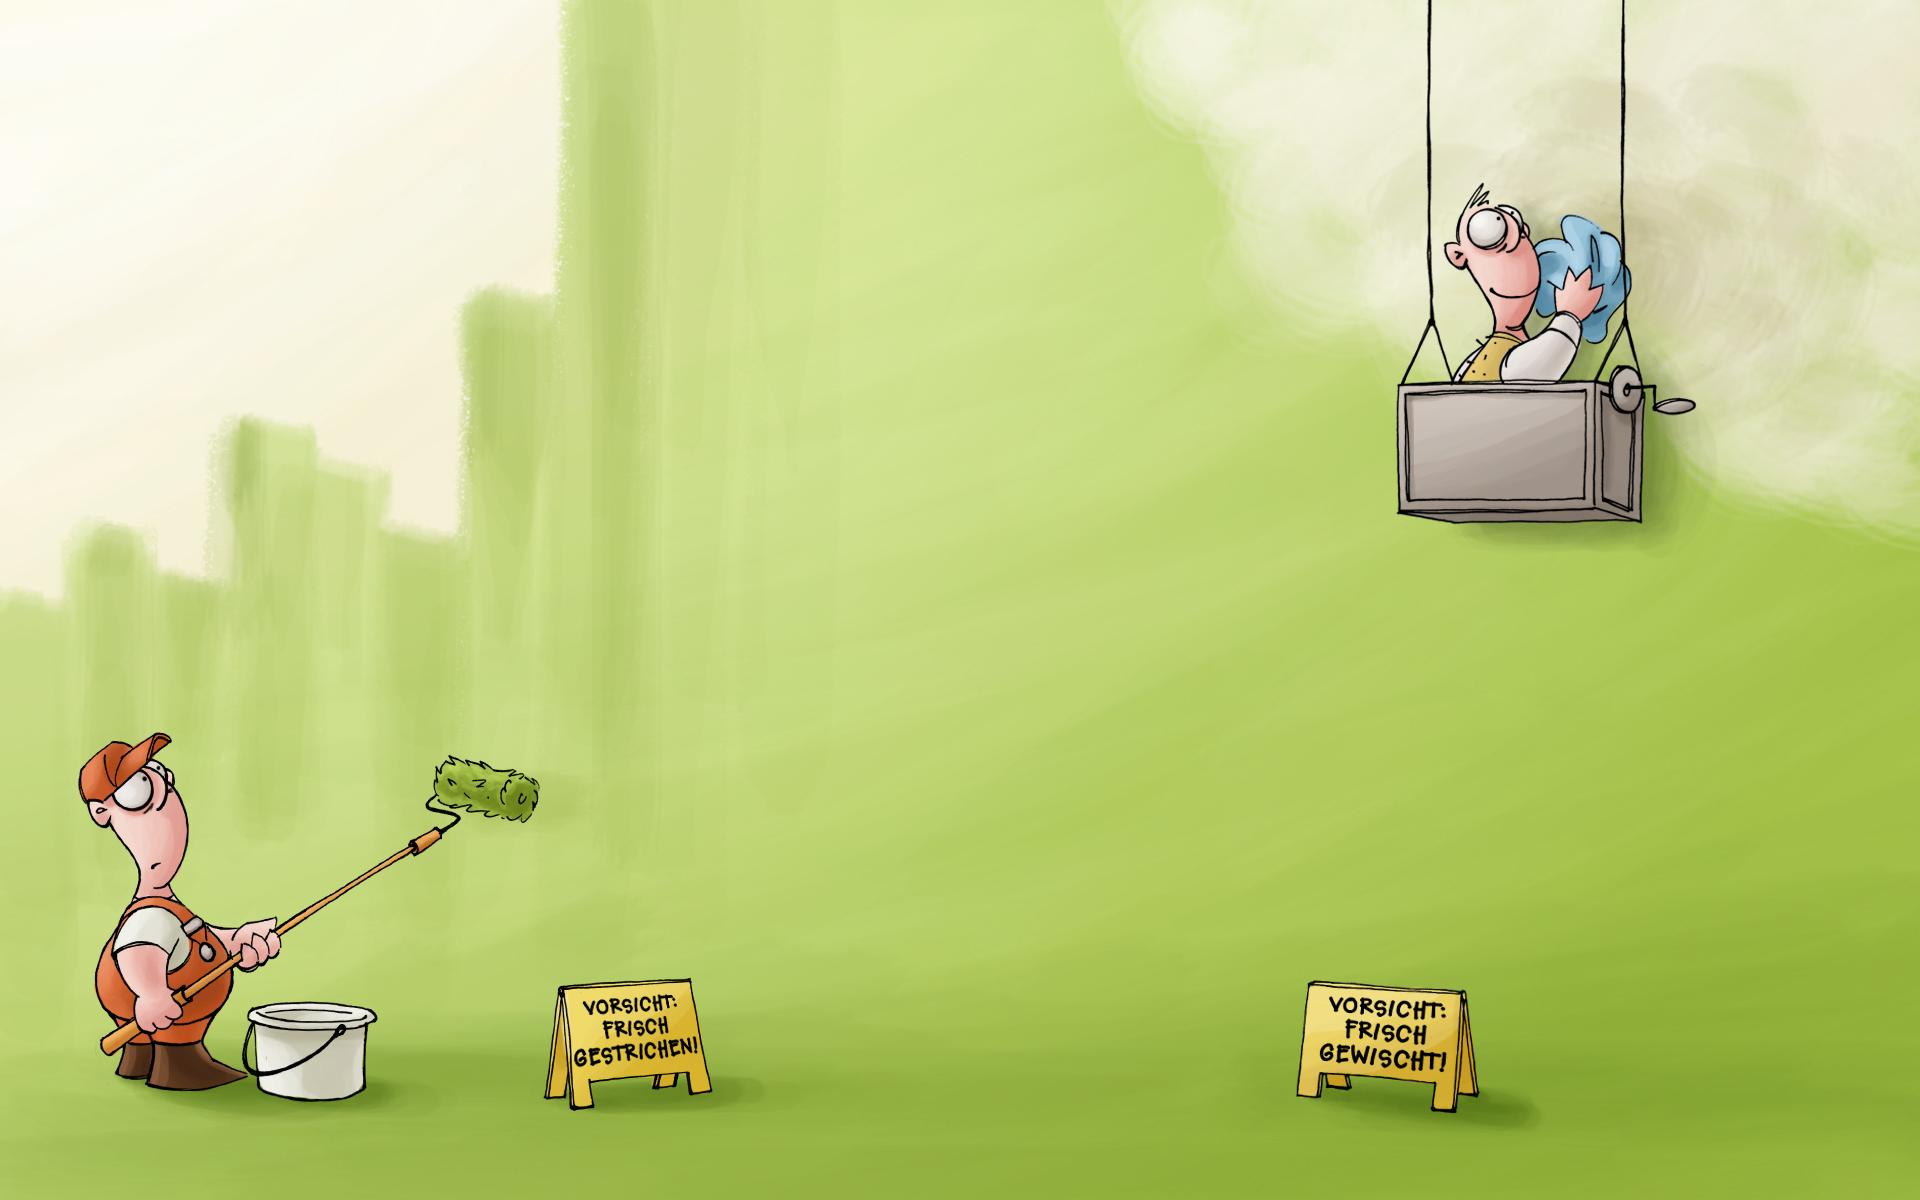 700x1243 cute cartoon couple wallpapers for mobile>. Cartoon Wallpapers HD | PixelsTalk.Net